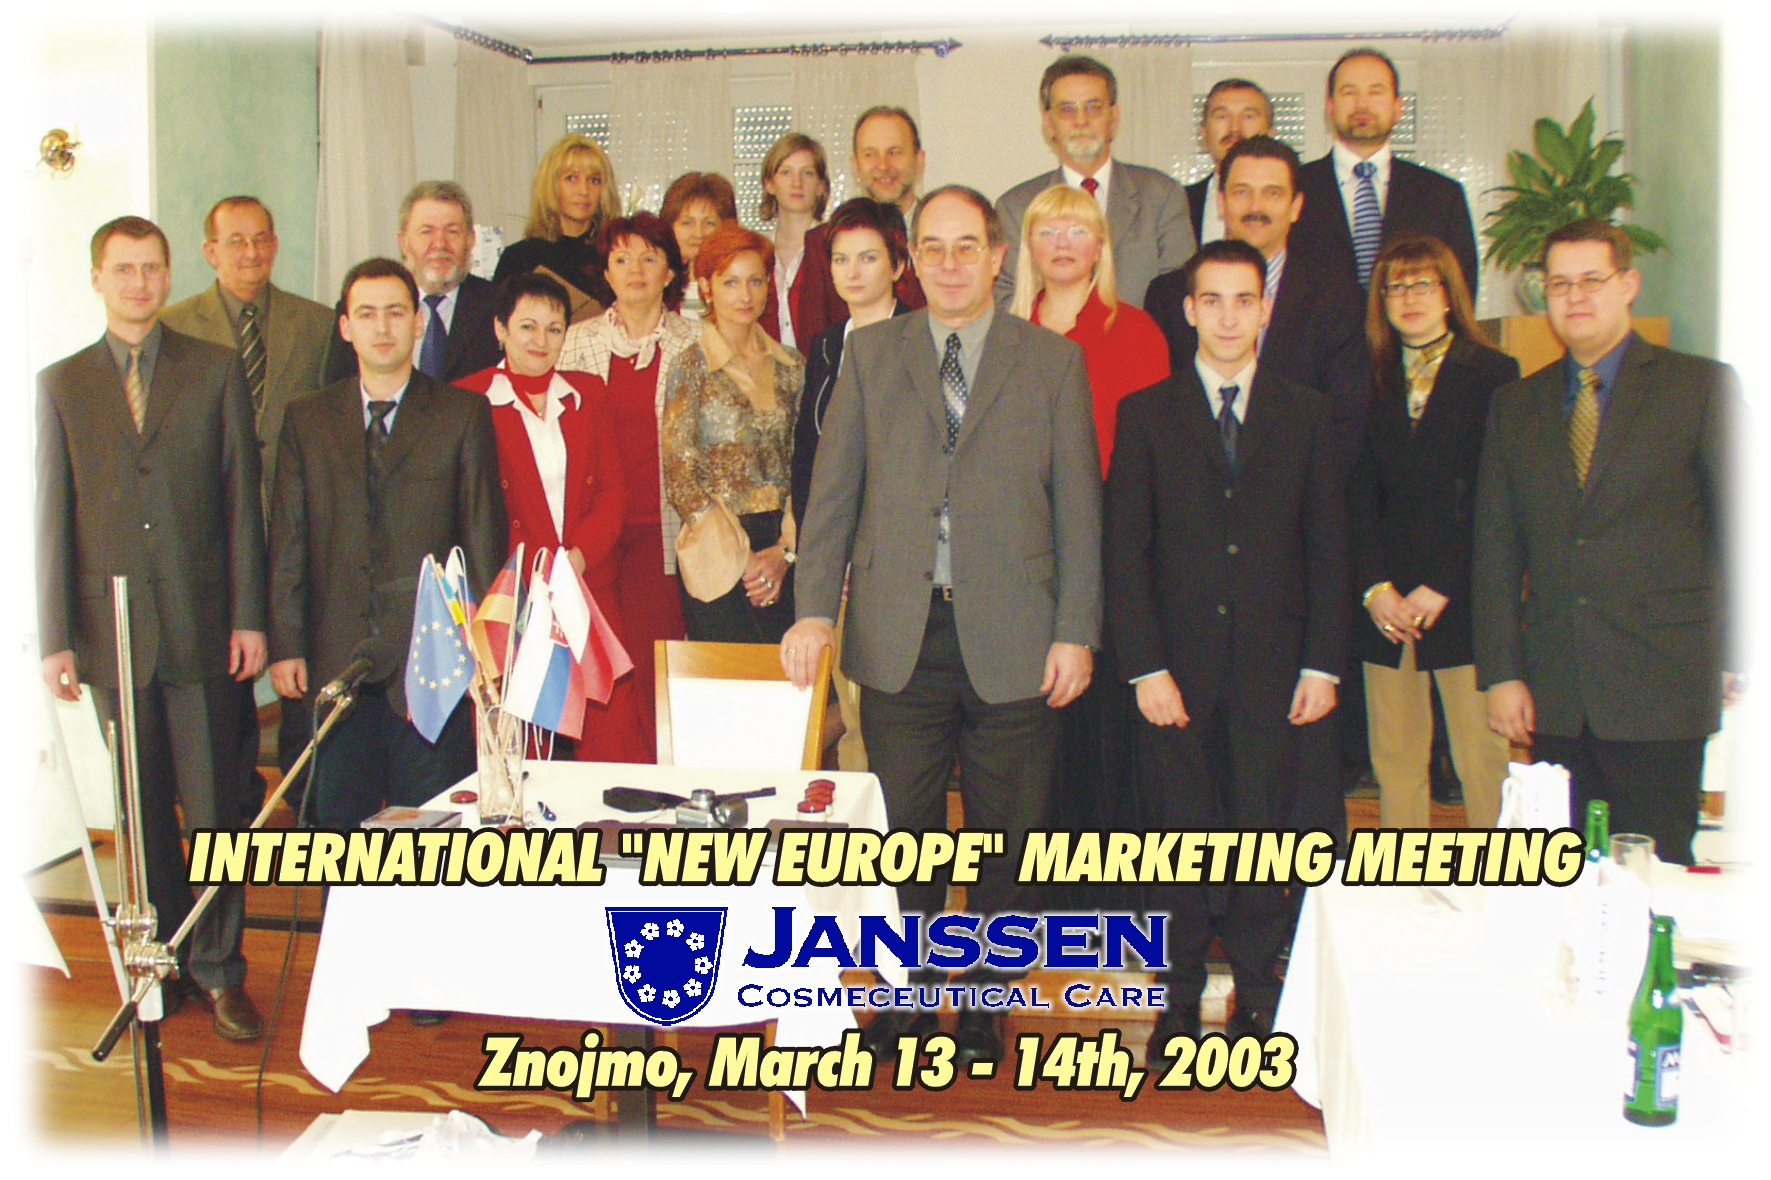 Marketing Meeting in Znojmo 2003